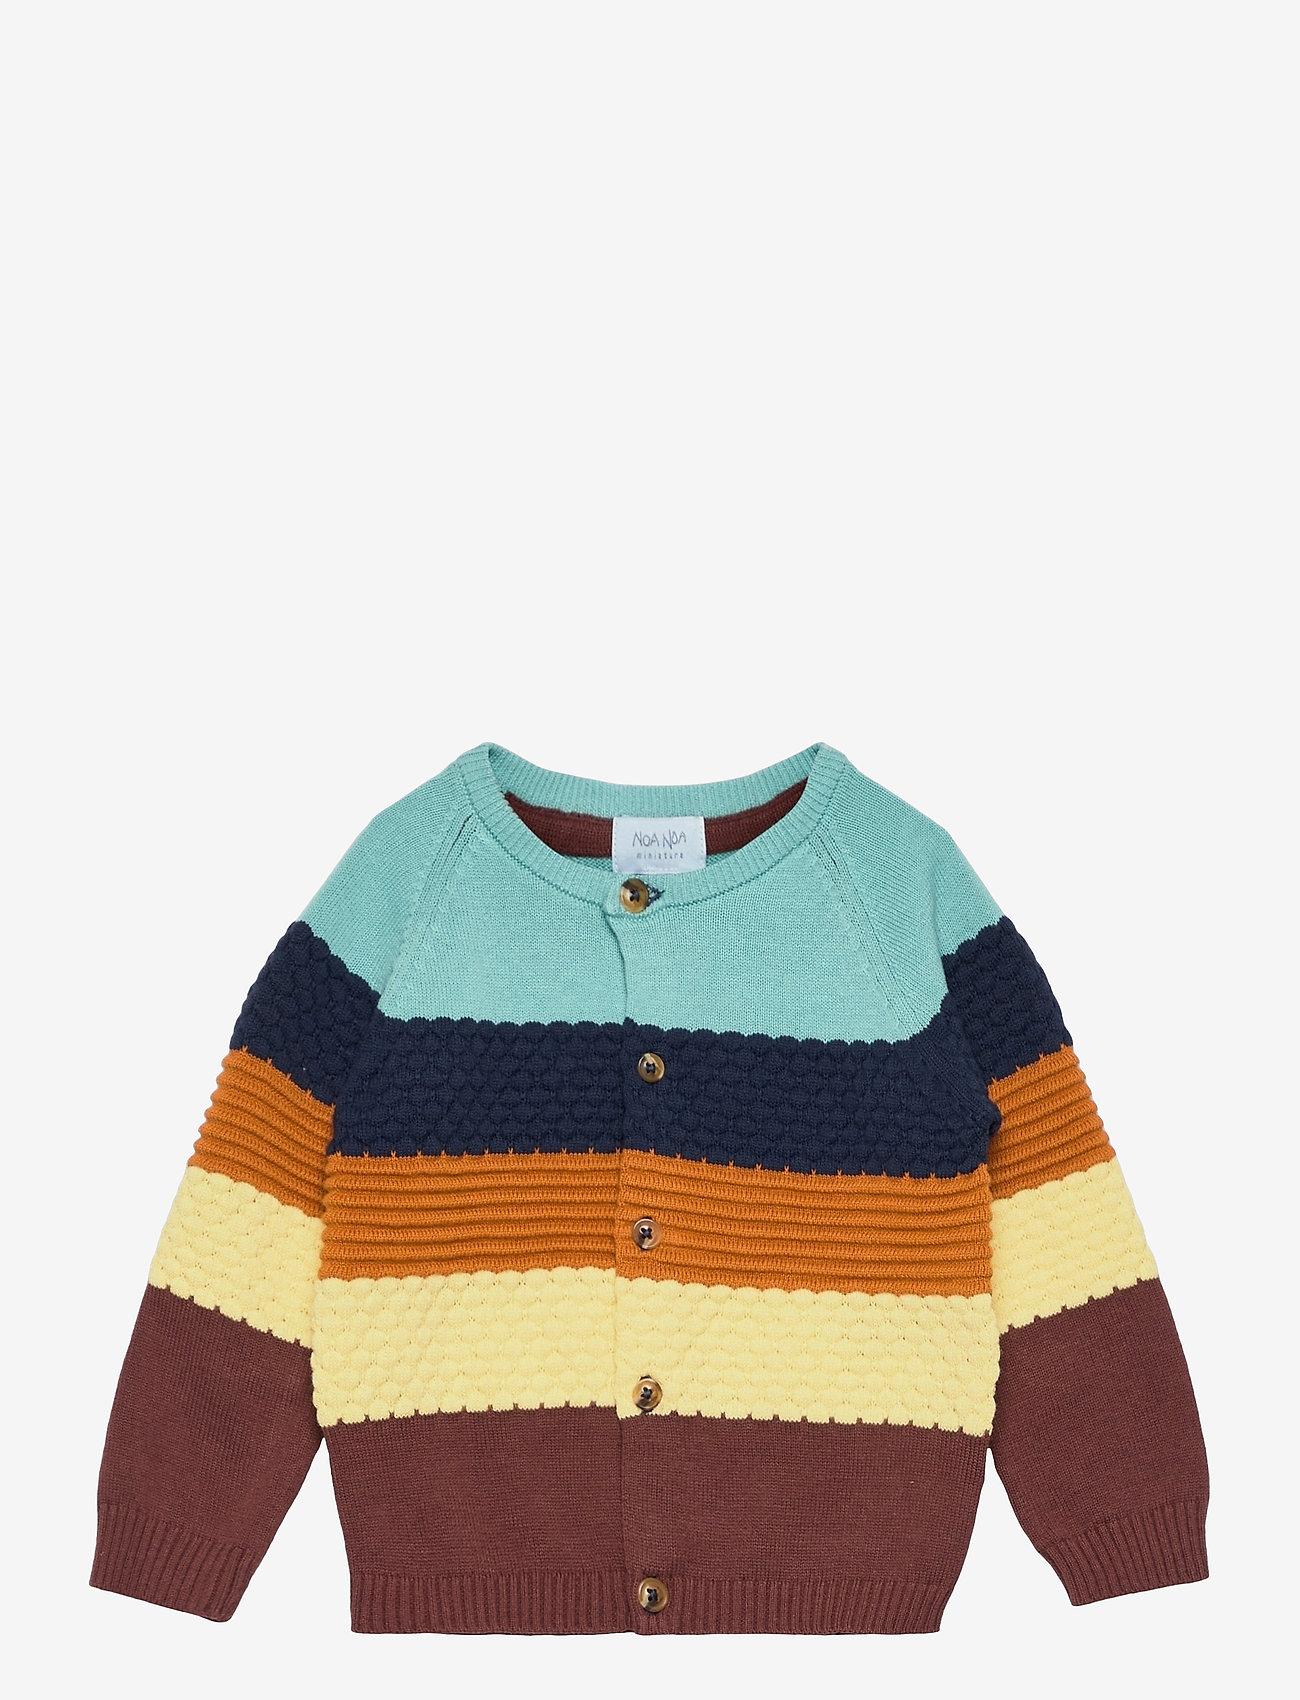 Noa Noa Miniature - Cardigan - gilets - art multicolour - 0